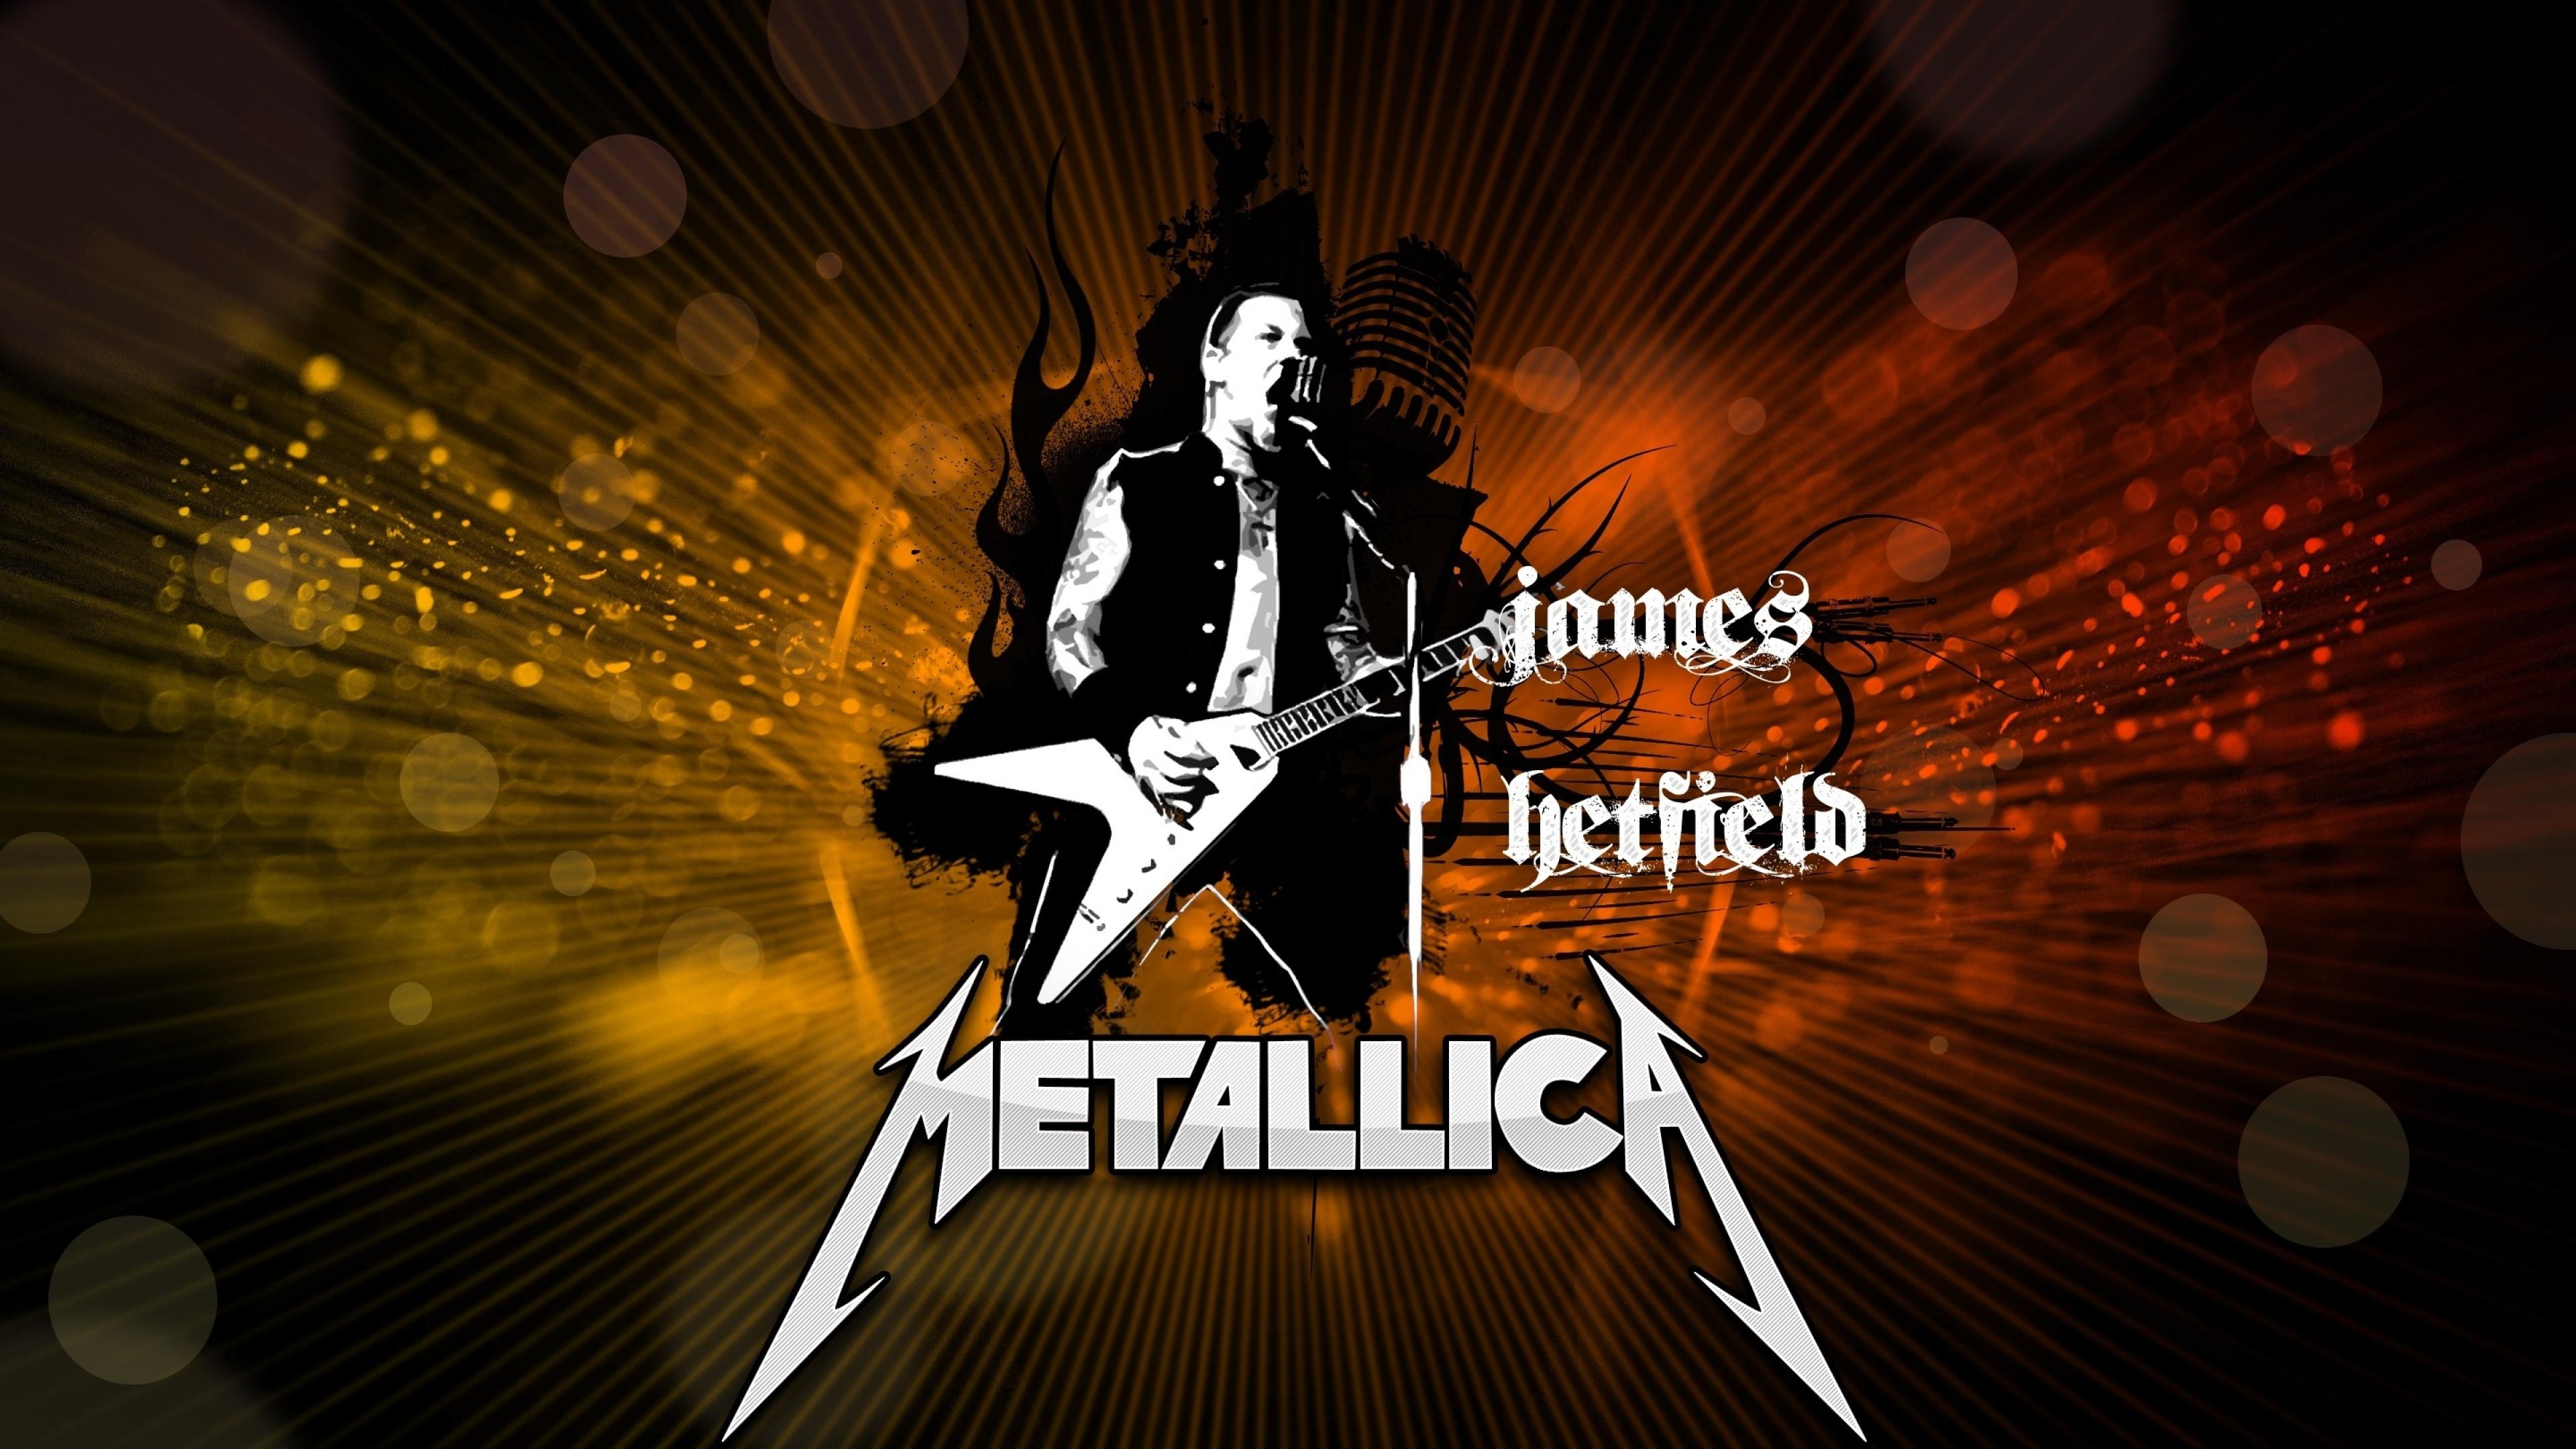 Wallpaper metallica, graphics, soloist, guitarist, name